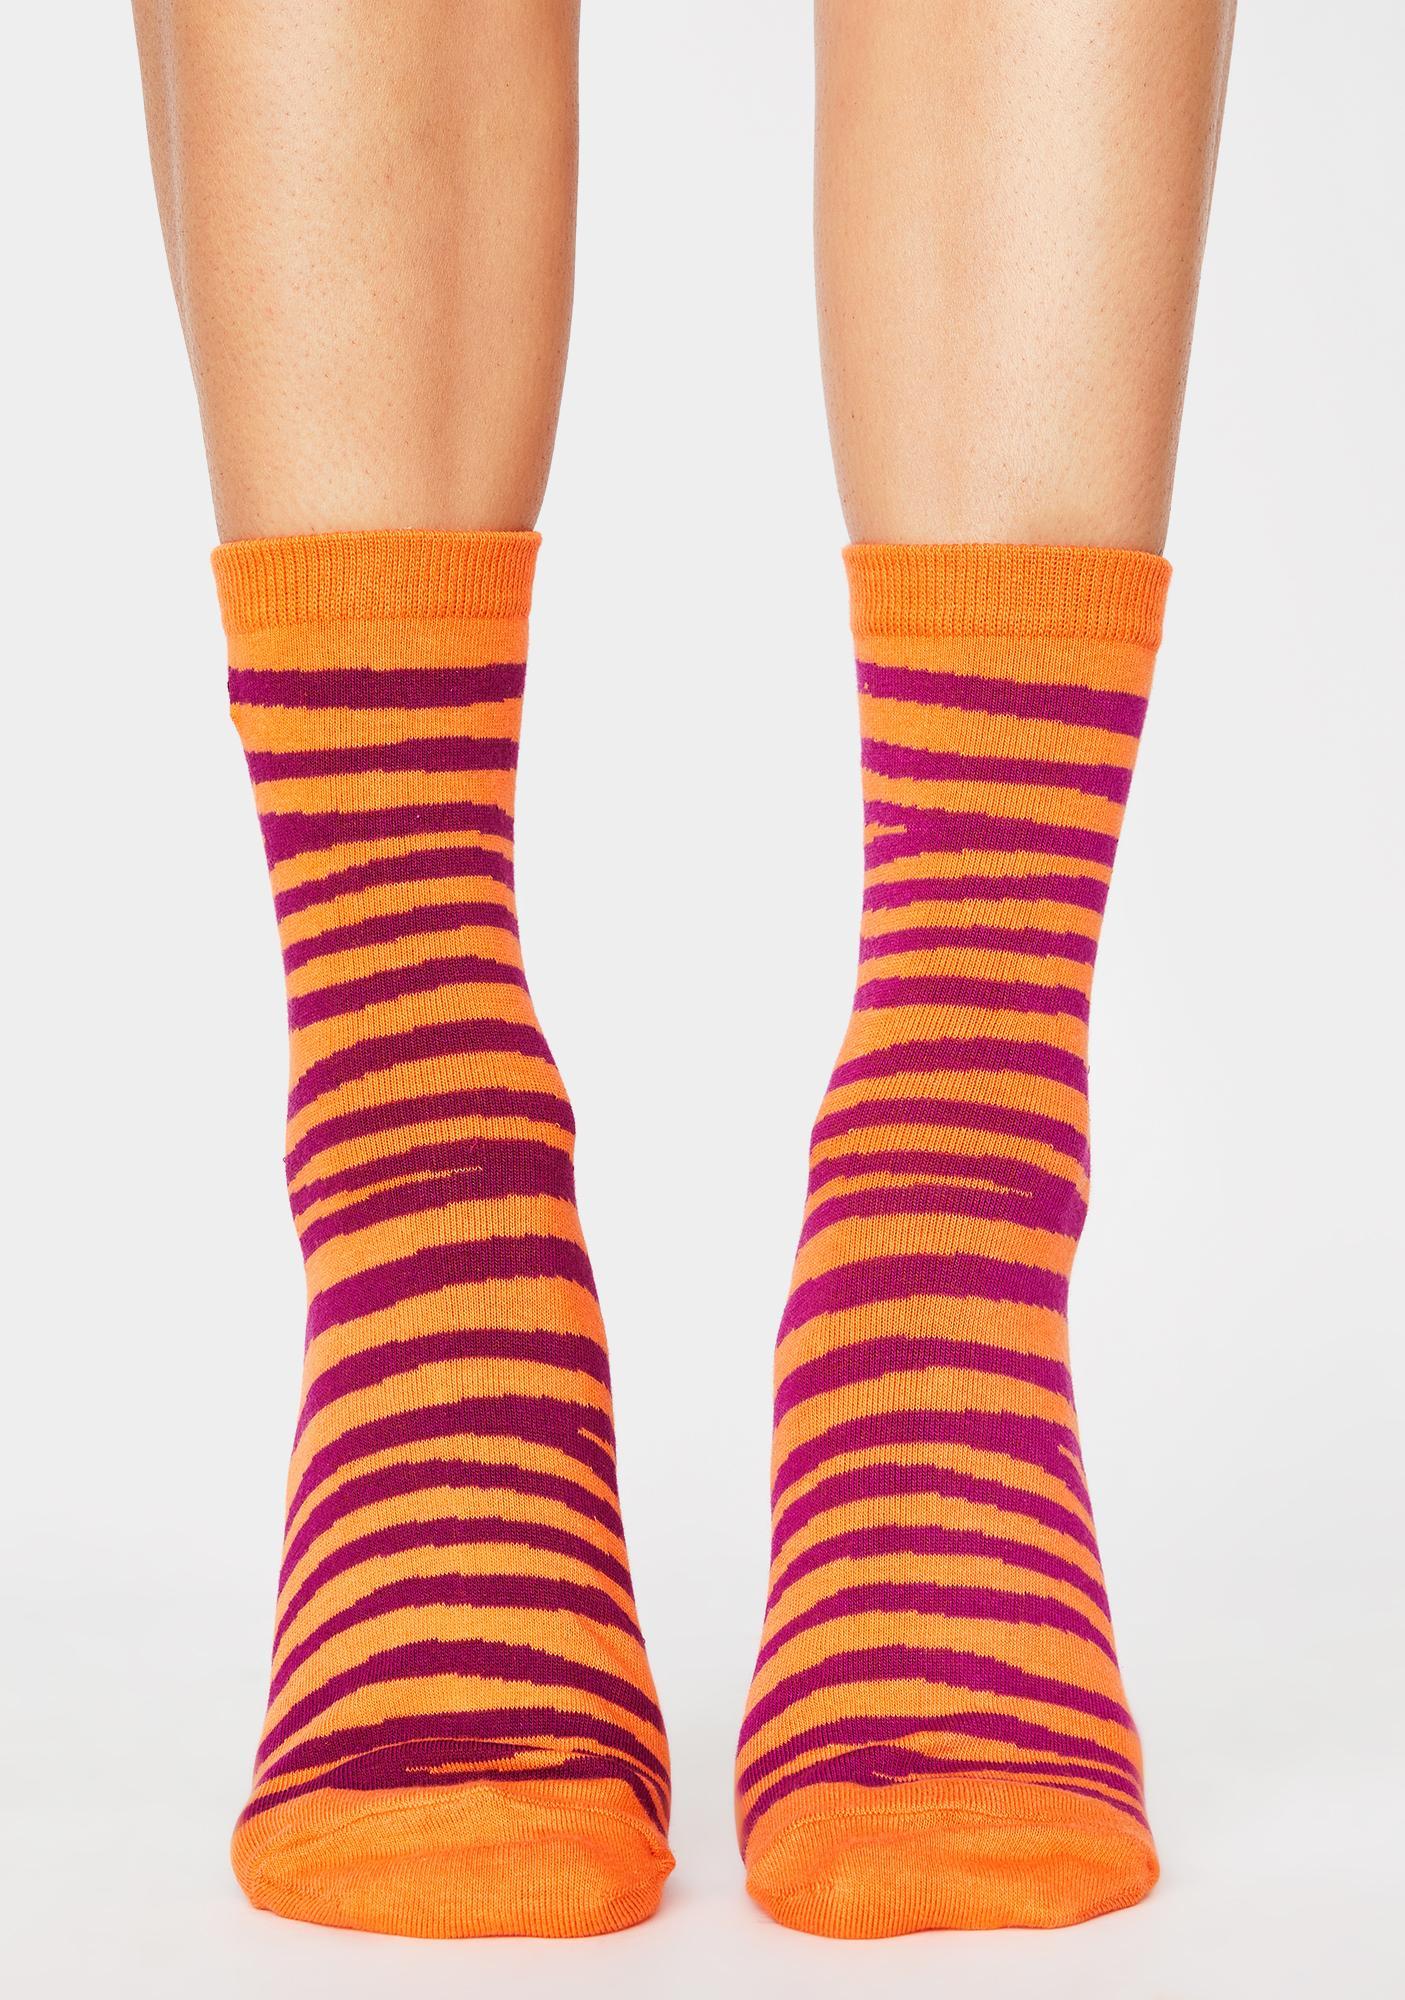 Obey Twinning Zebra Crew Socks 2 Pack